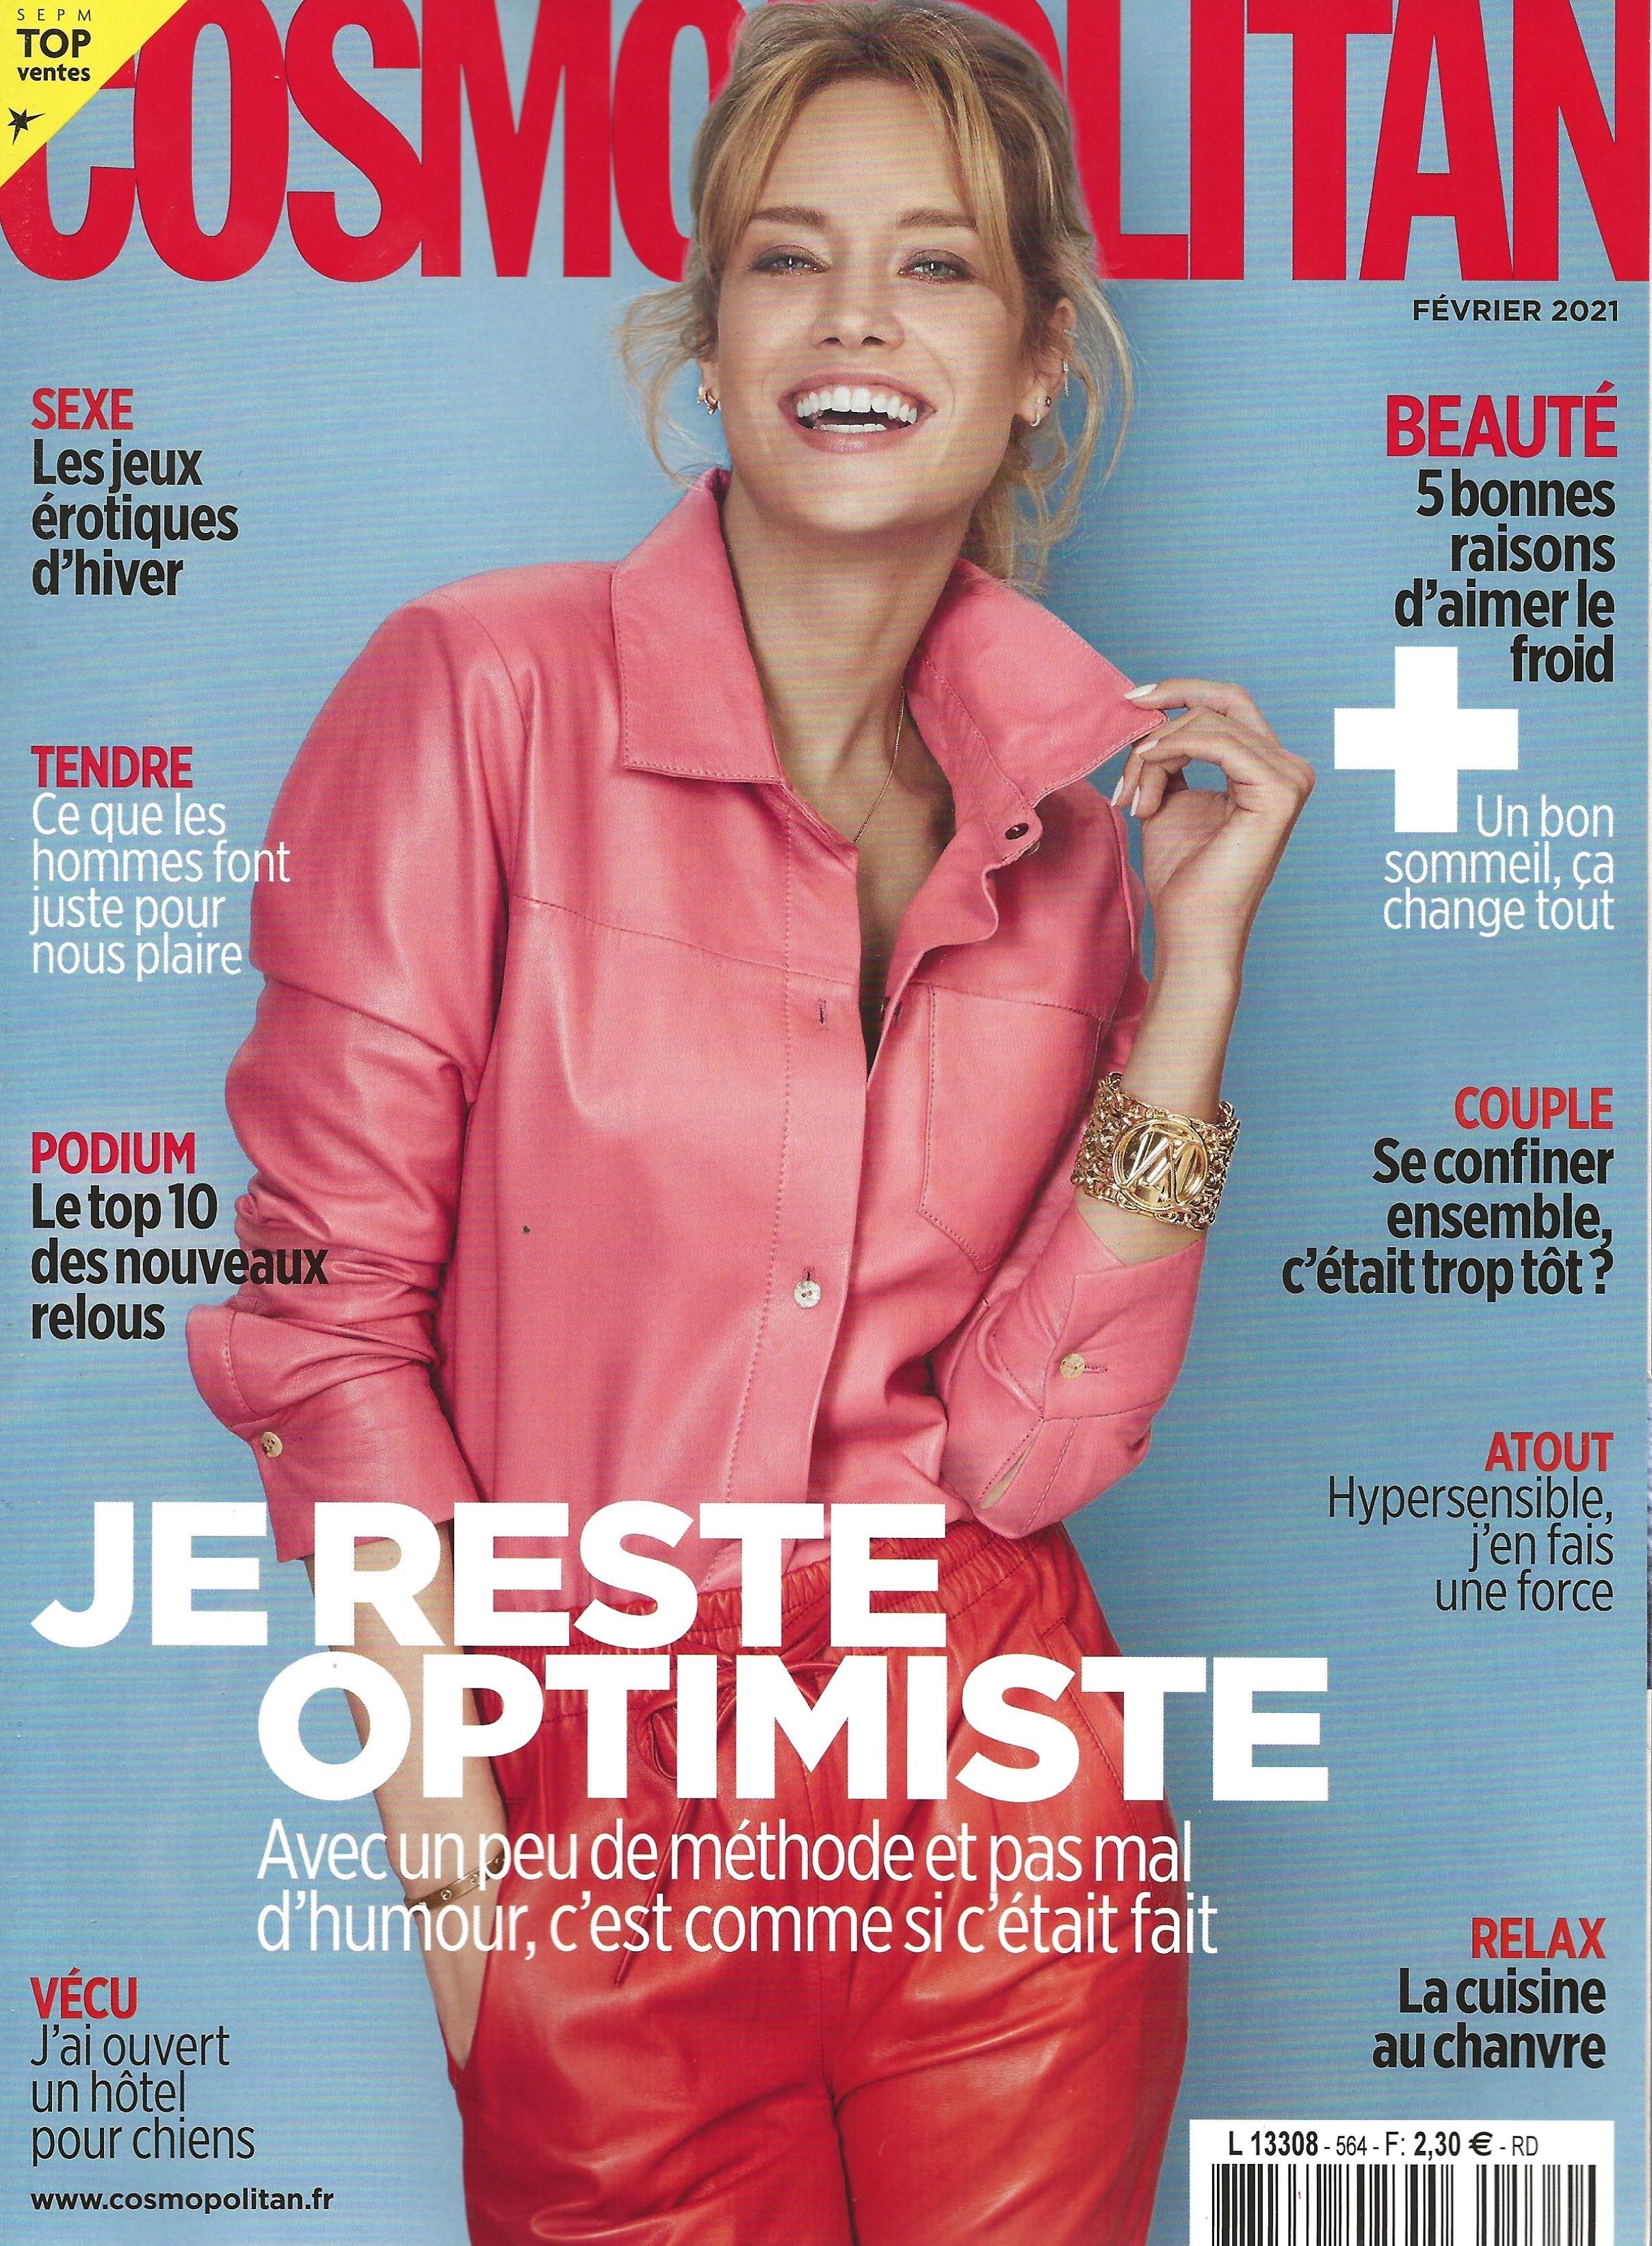 dada-diane-ducasse-cosmopolitan-presse-fevrier-2021-1